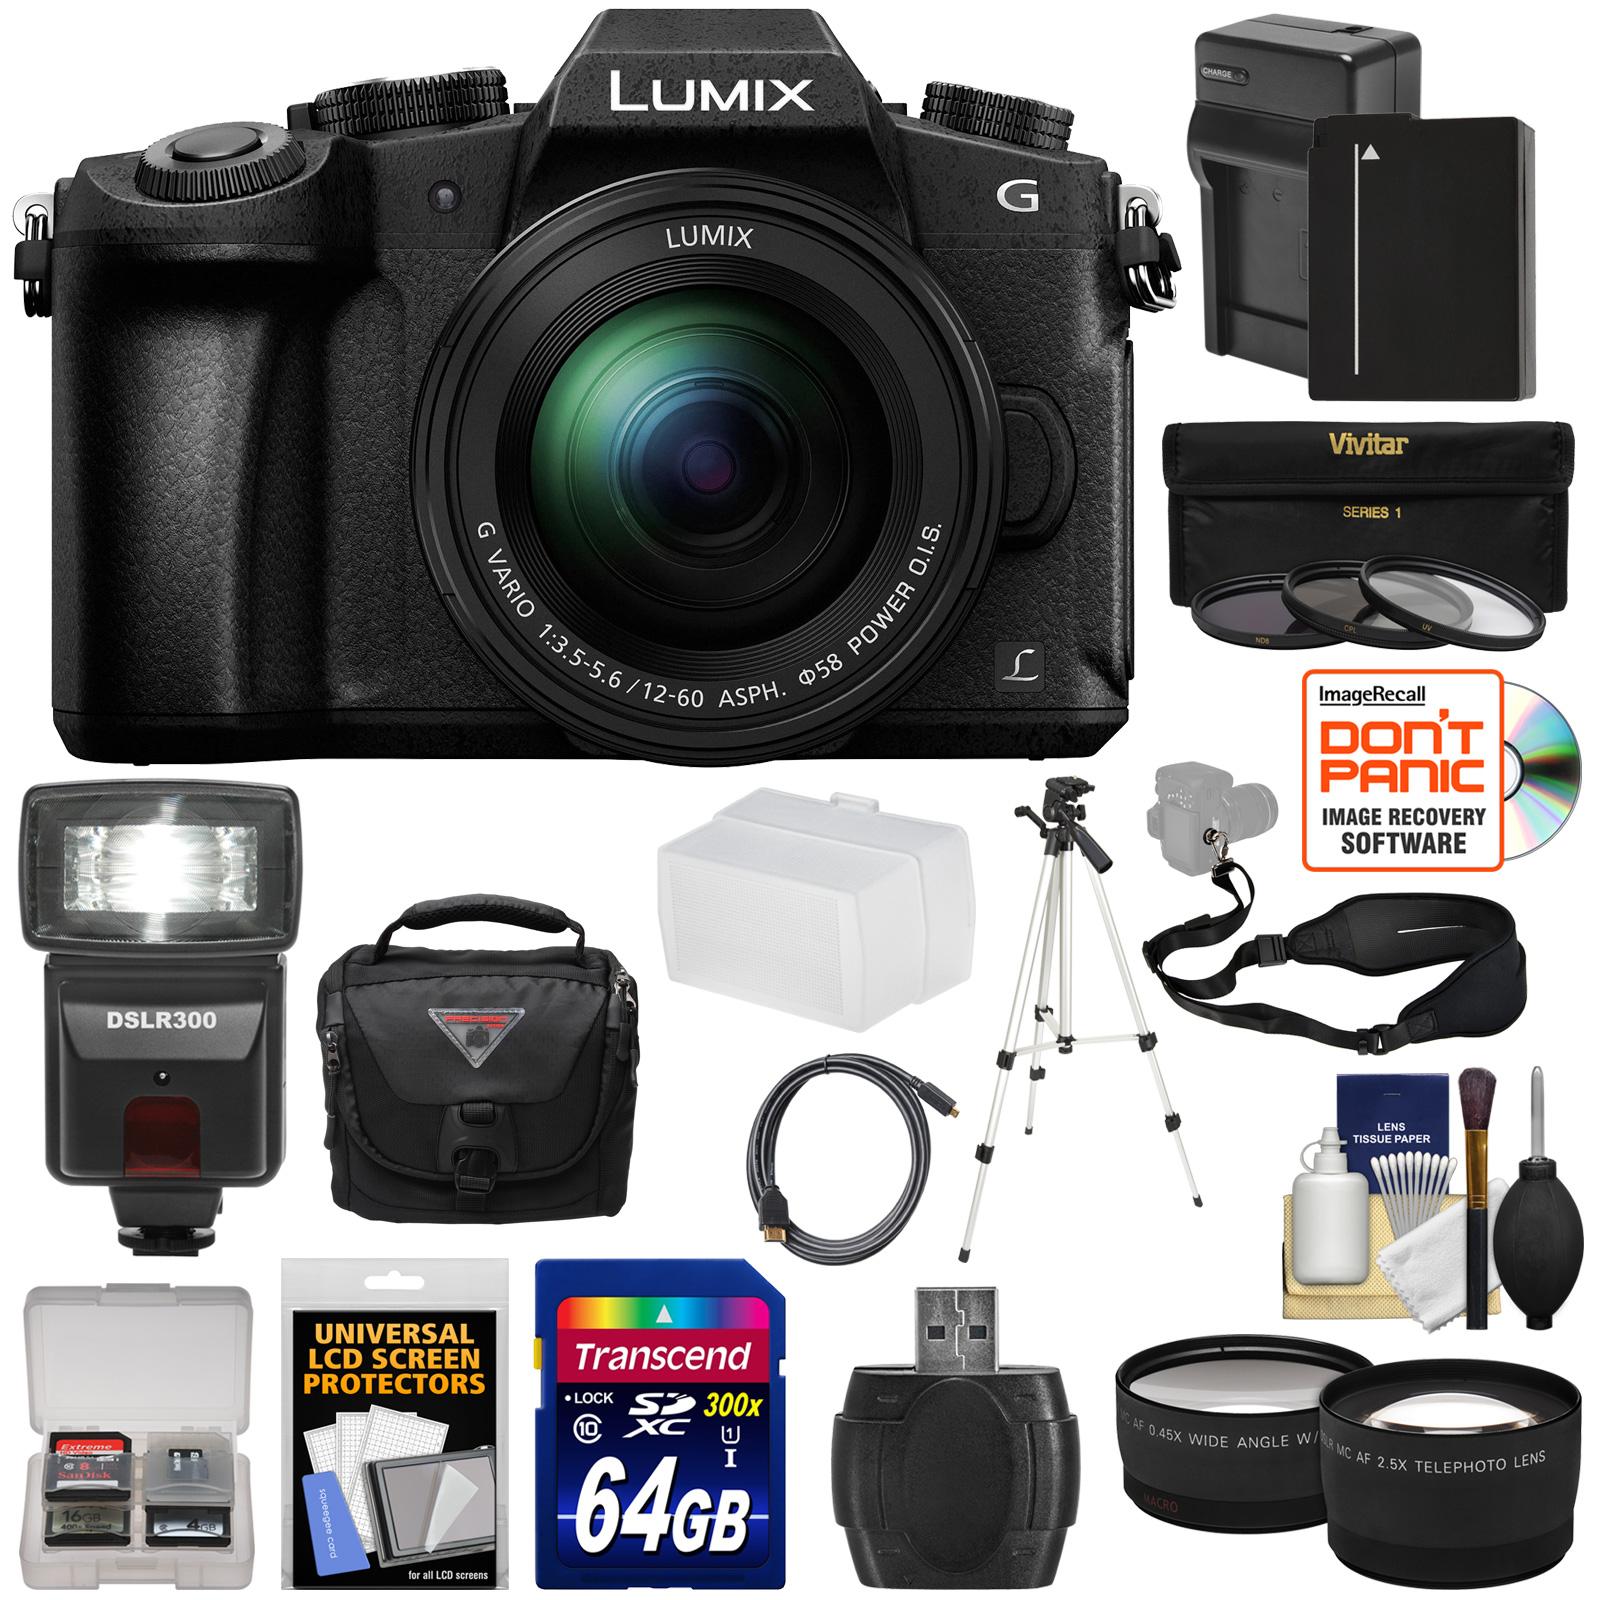 Panasonic Lumix DMC-G85 4K Wi-Fi Digital Camera & 12-60mm Lens with 64GB